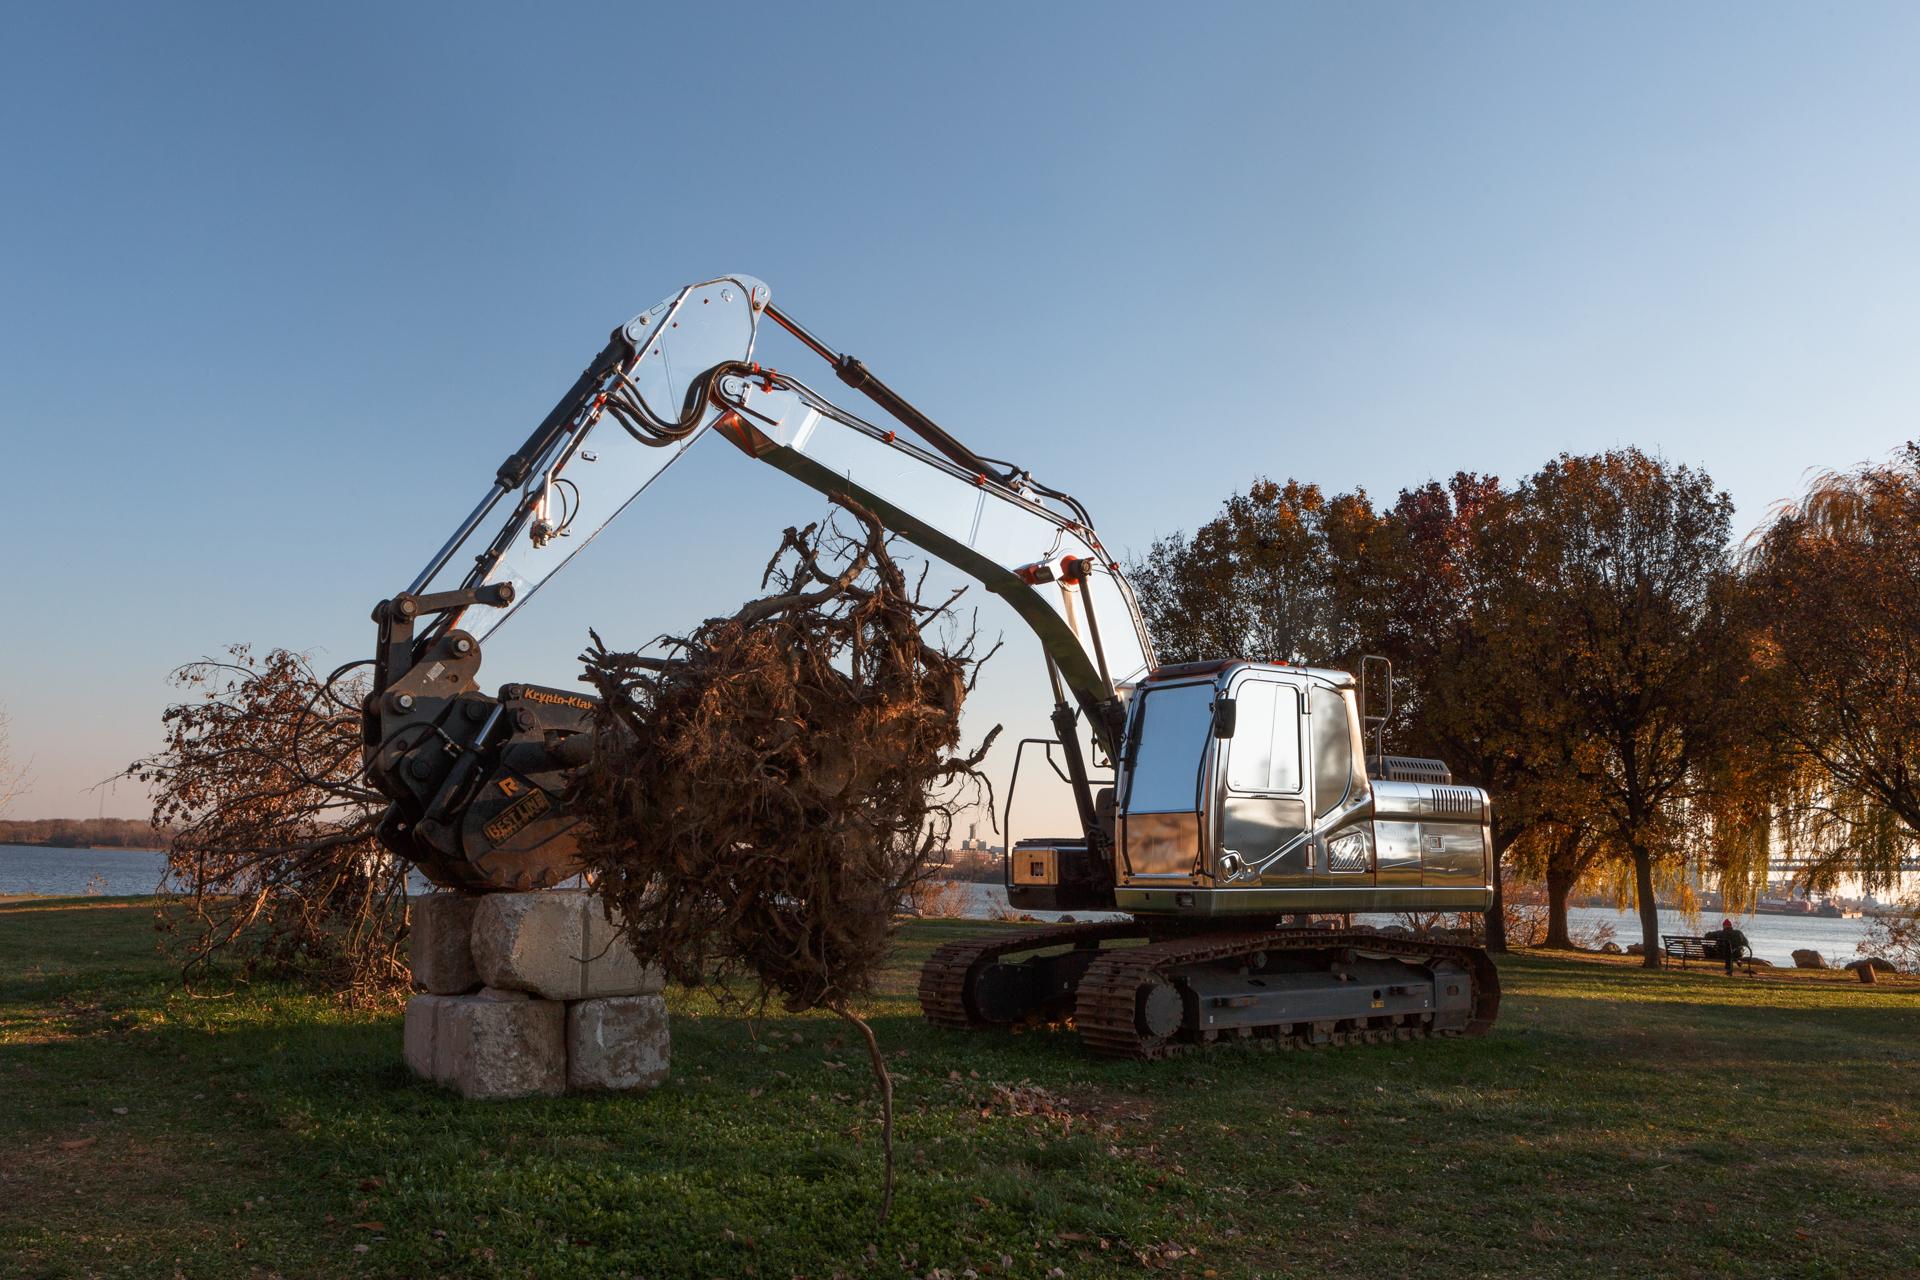 Plainsight is 20/20  RAIR (Recycled Artist in Residency) Maple tree, excavator, mirrored vinyl, and construction fencing Penn Treaty Park   Photo: Steve Weinik/Mural Arts Philadelphia